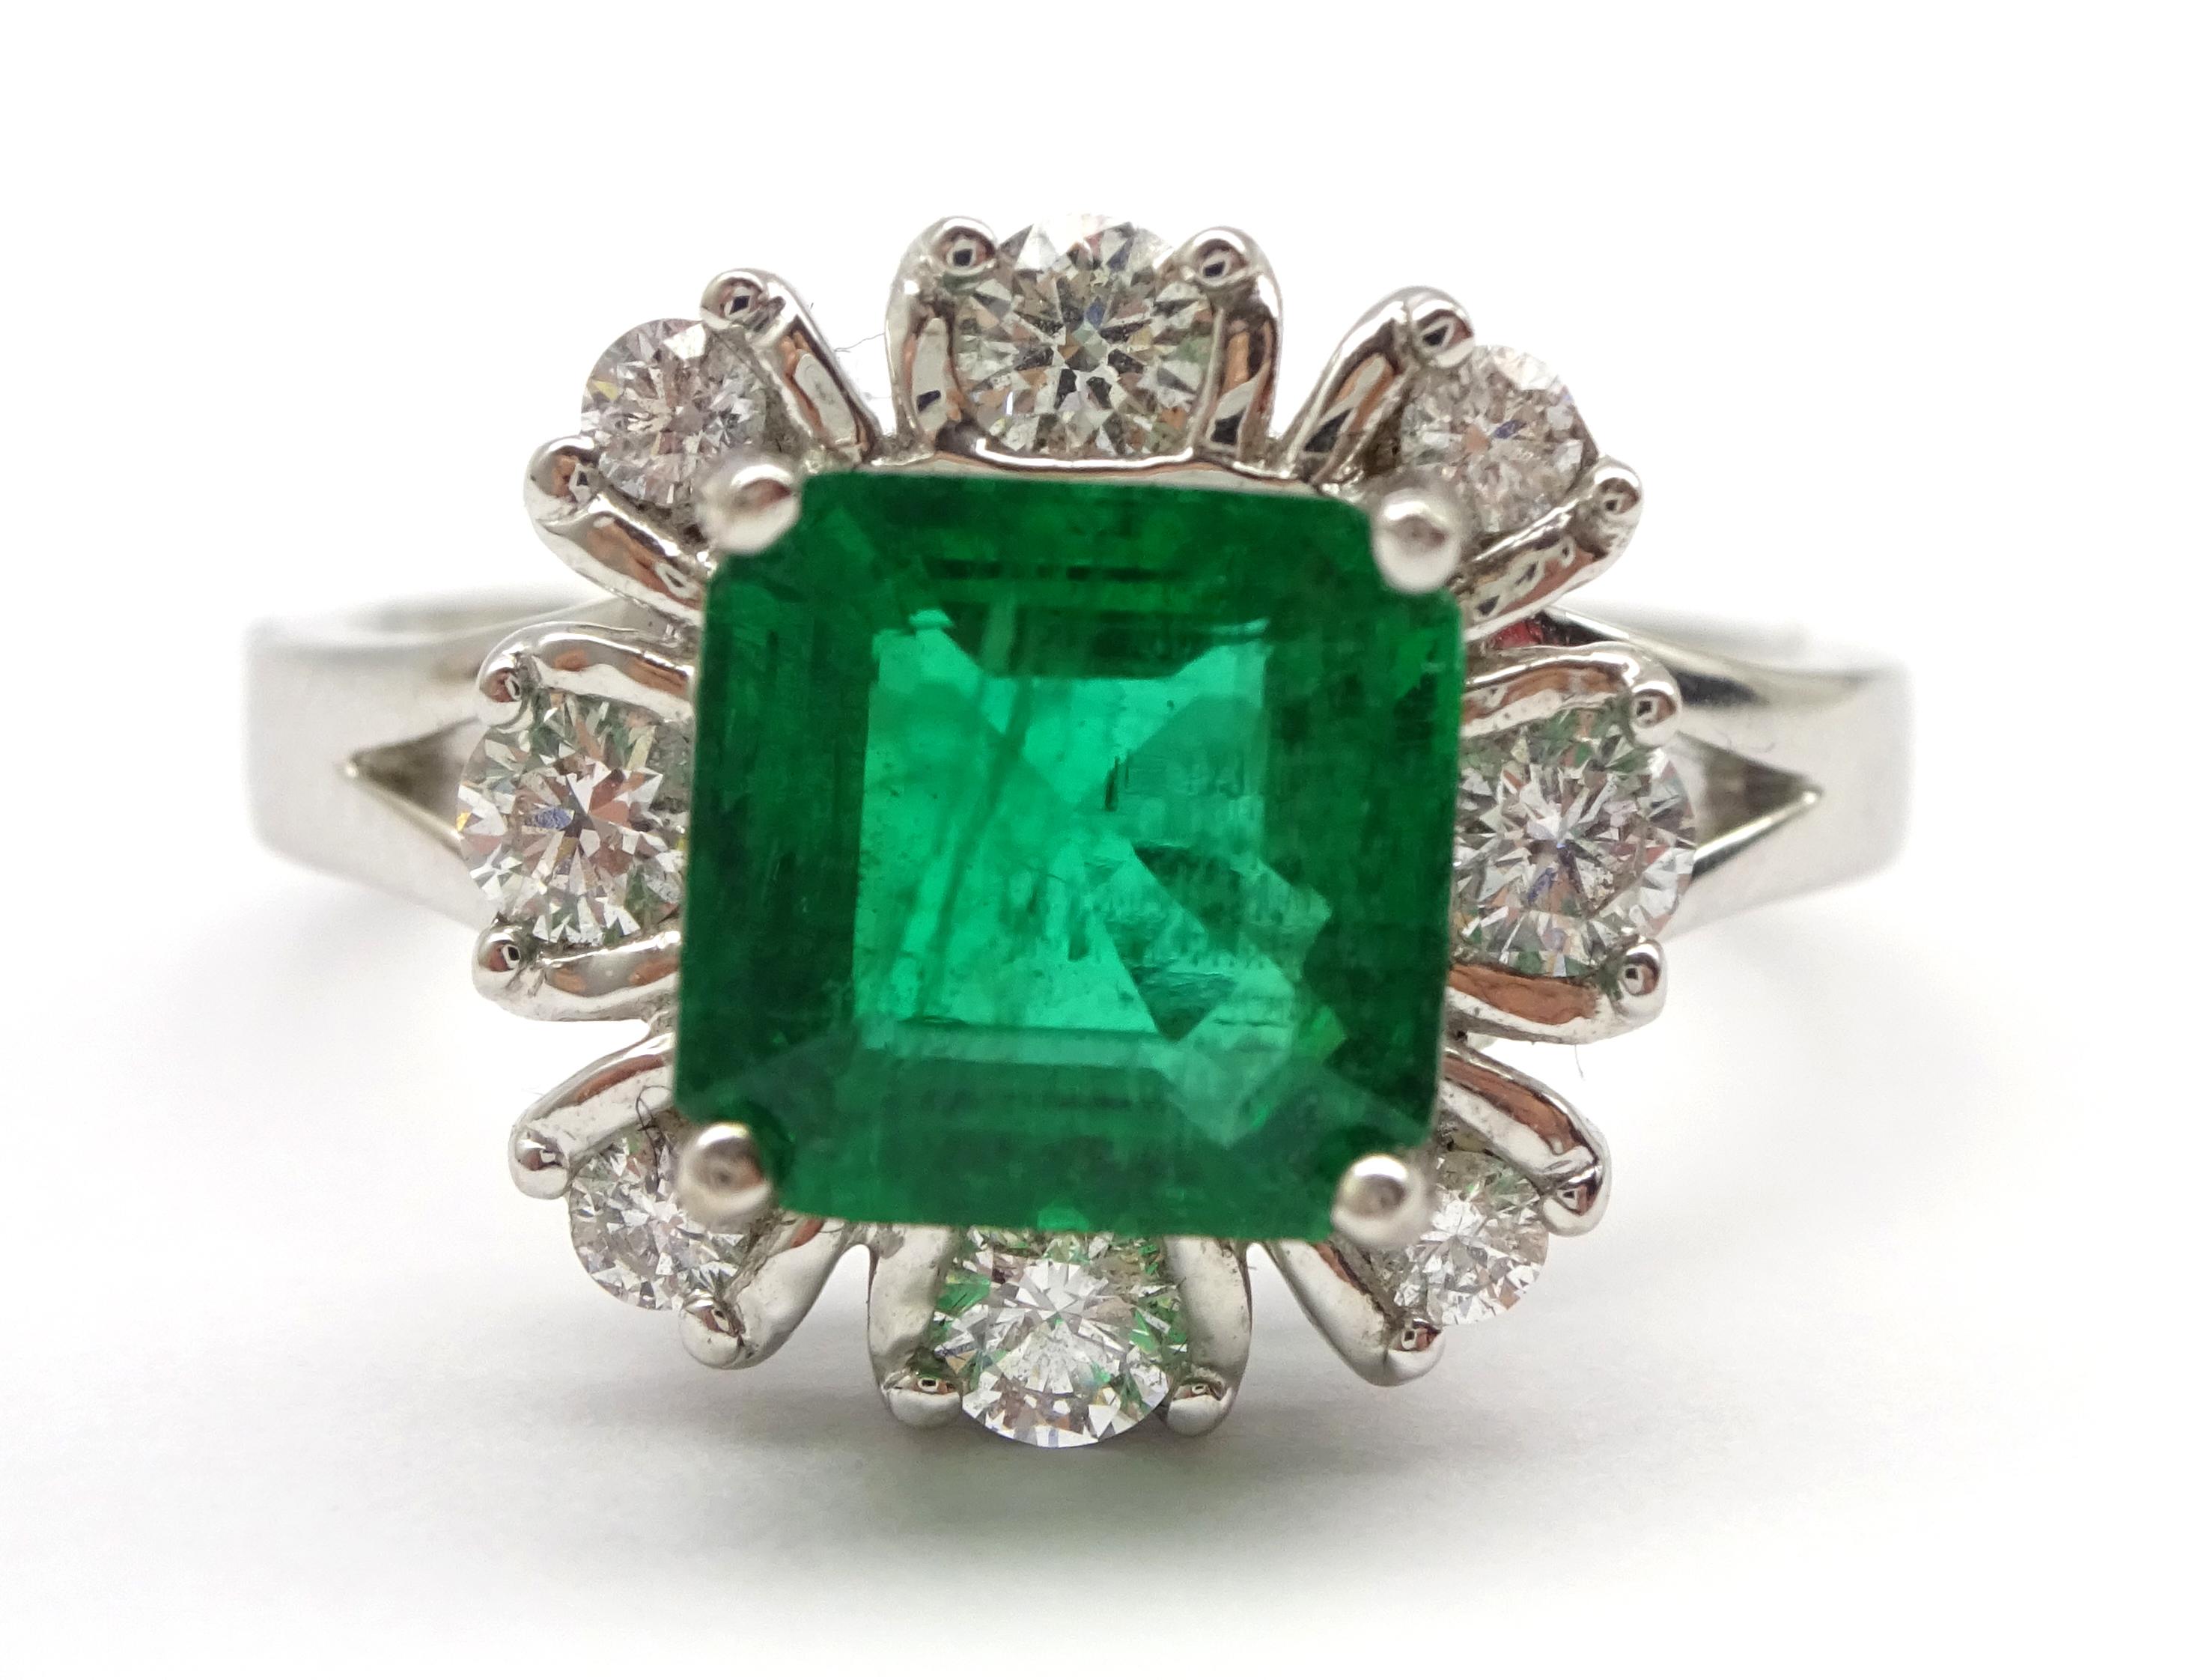 Lot 1004 - 18ct white gold fine emerald and diamond cluster ring hallmarked, emerald 1.